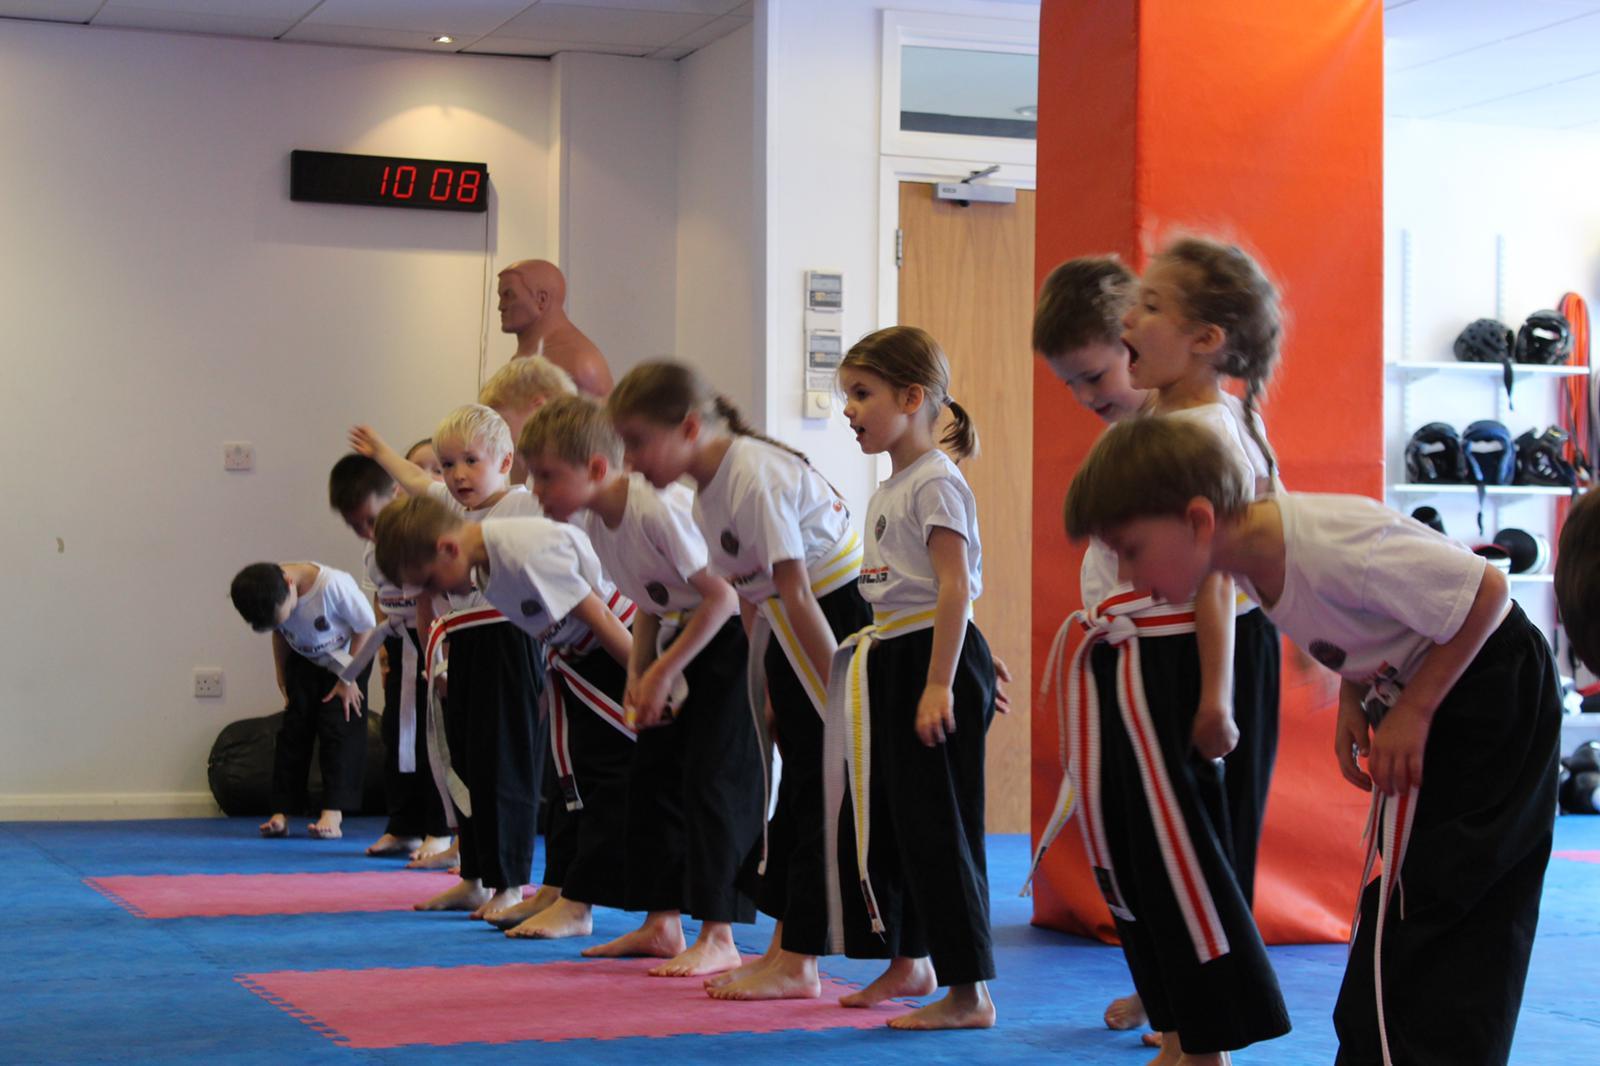 Kids training at Mavericks Martial Arts in Guildford